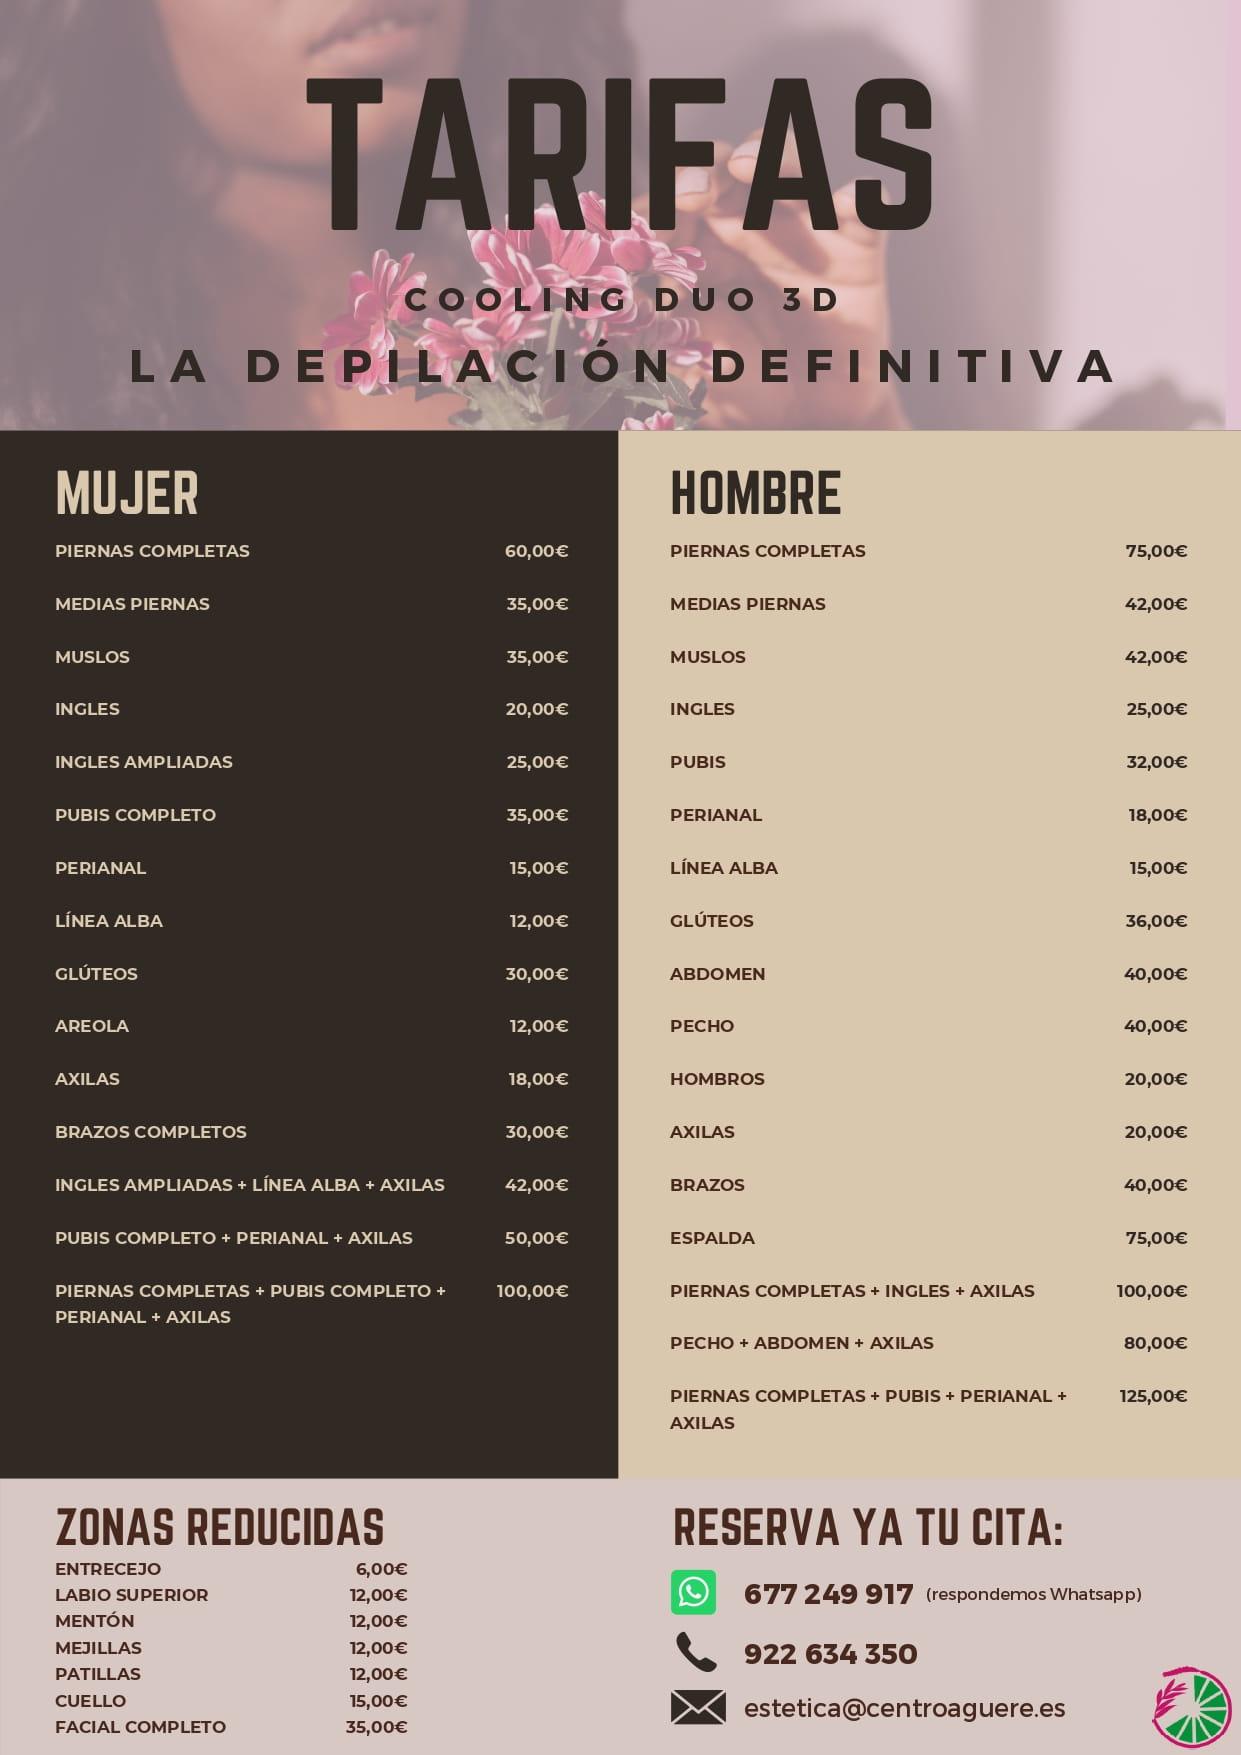 Centro de estética en Tenerife | Depilación